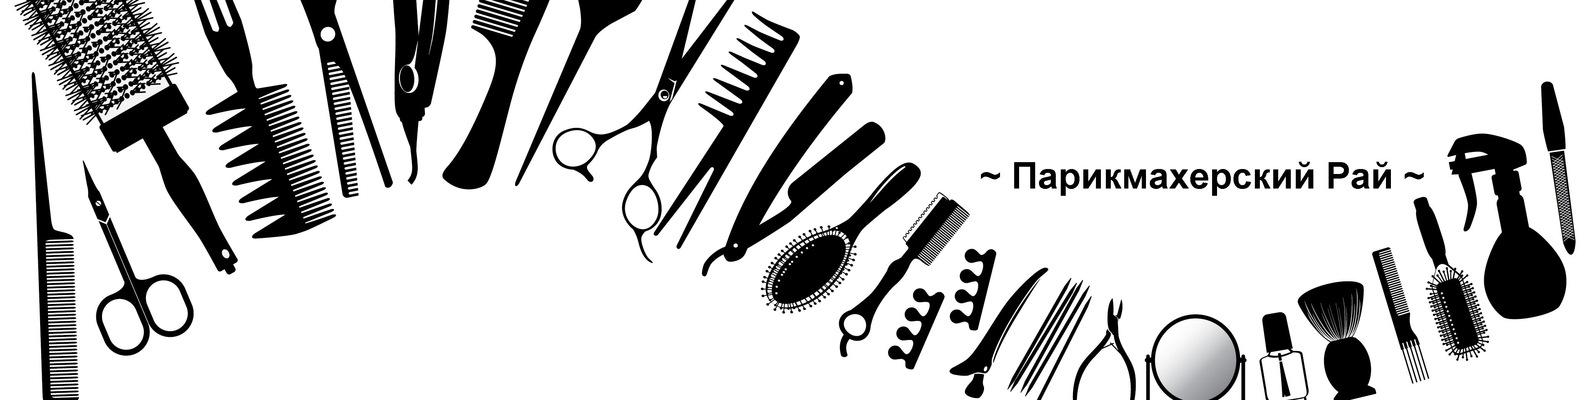 кованые картинка шаблон парикмахер вагонка